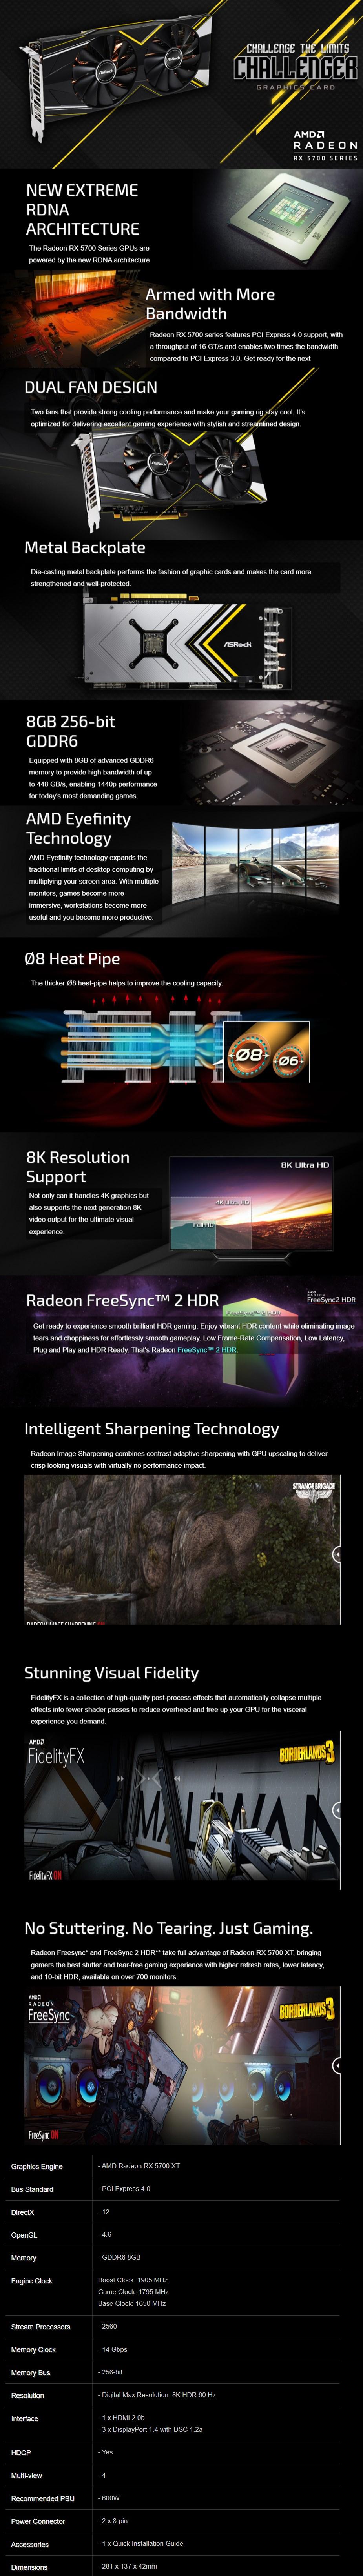 asrock-radeon-rx-5700xt-chaallenger-d-8gb-oc-video-card-ac28609-6.jpg